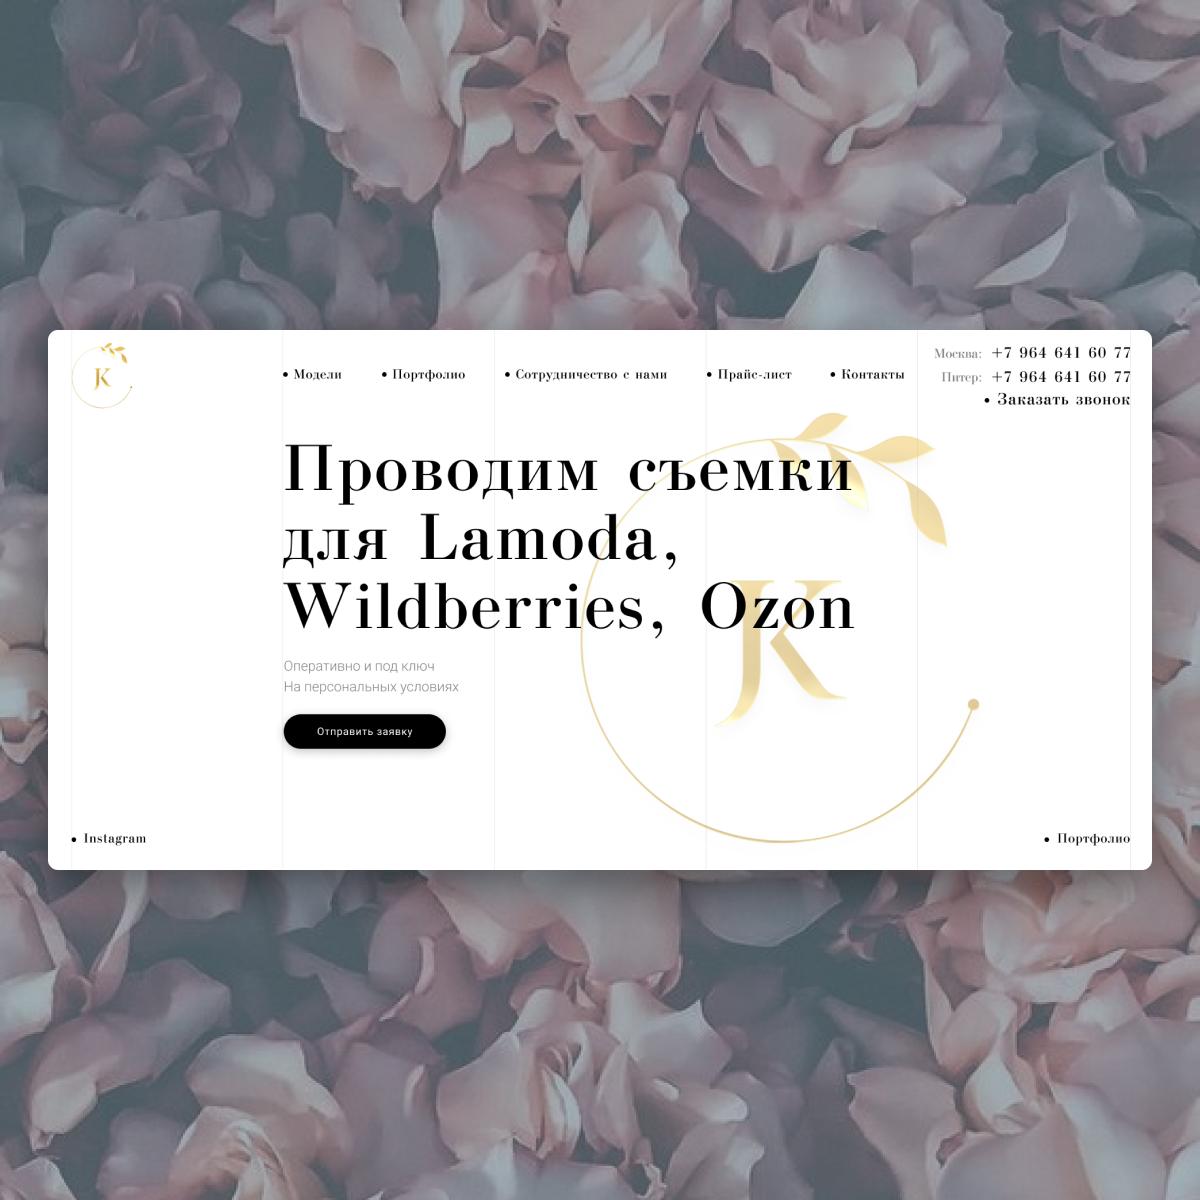 Figma UI ux webdesigner ве дизайнер